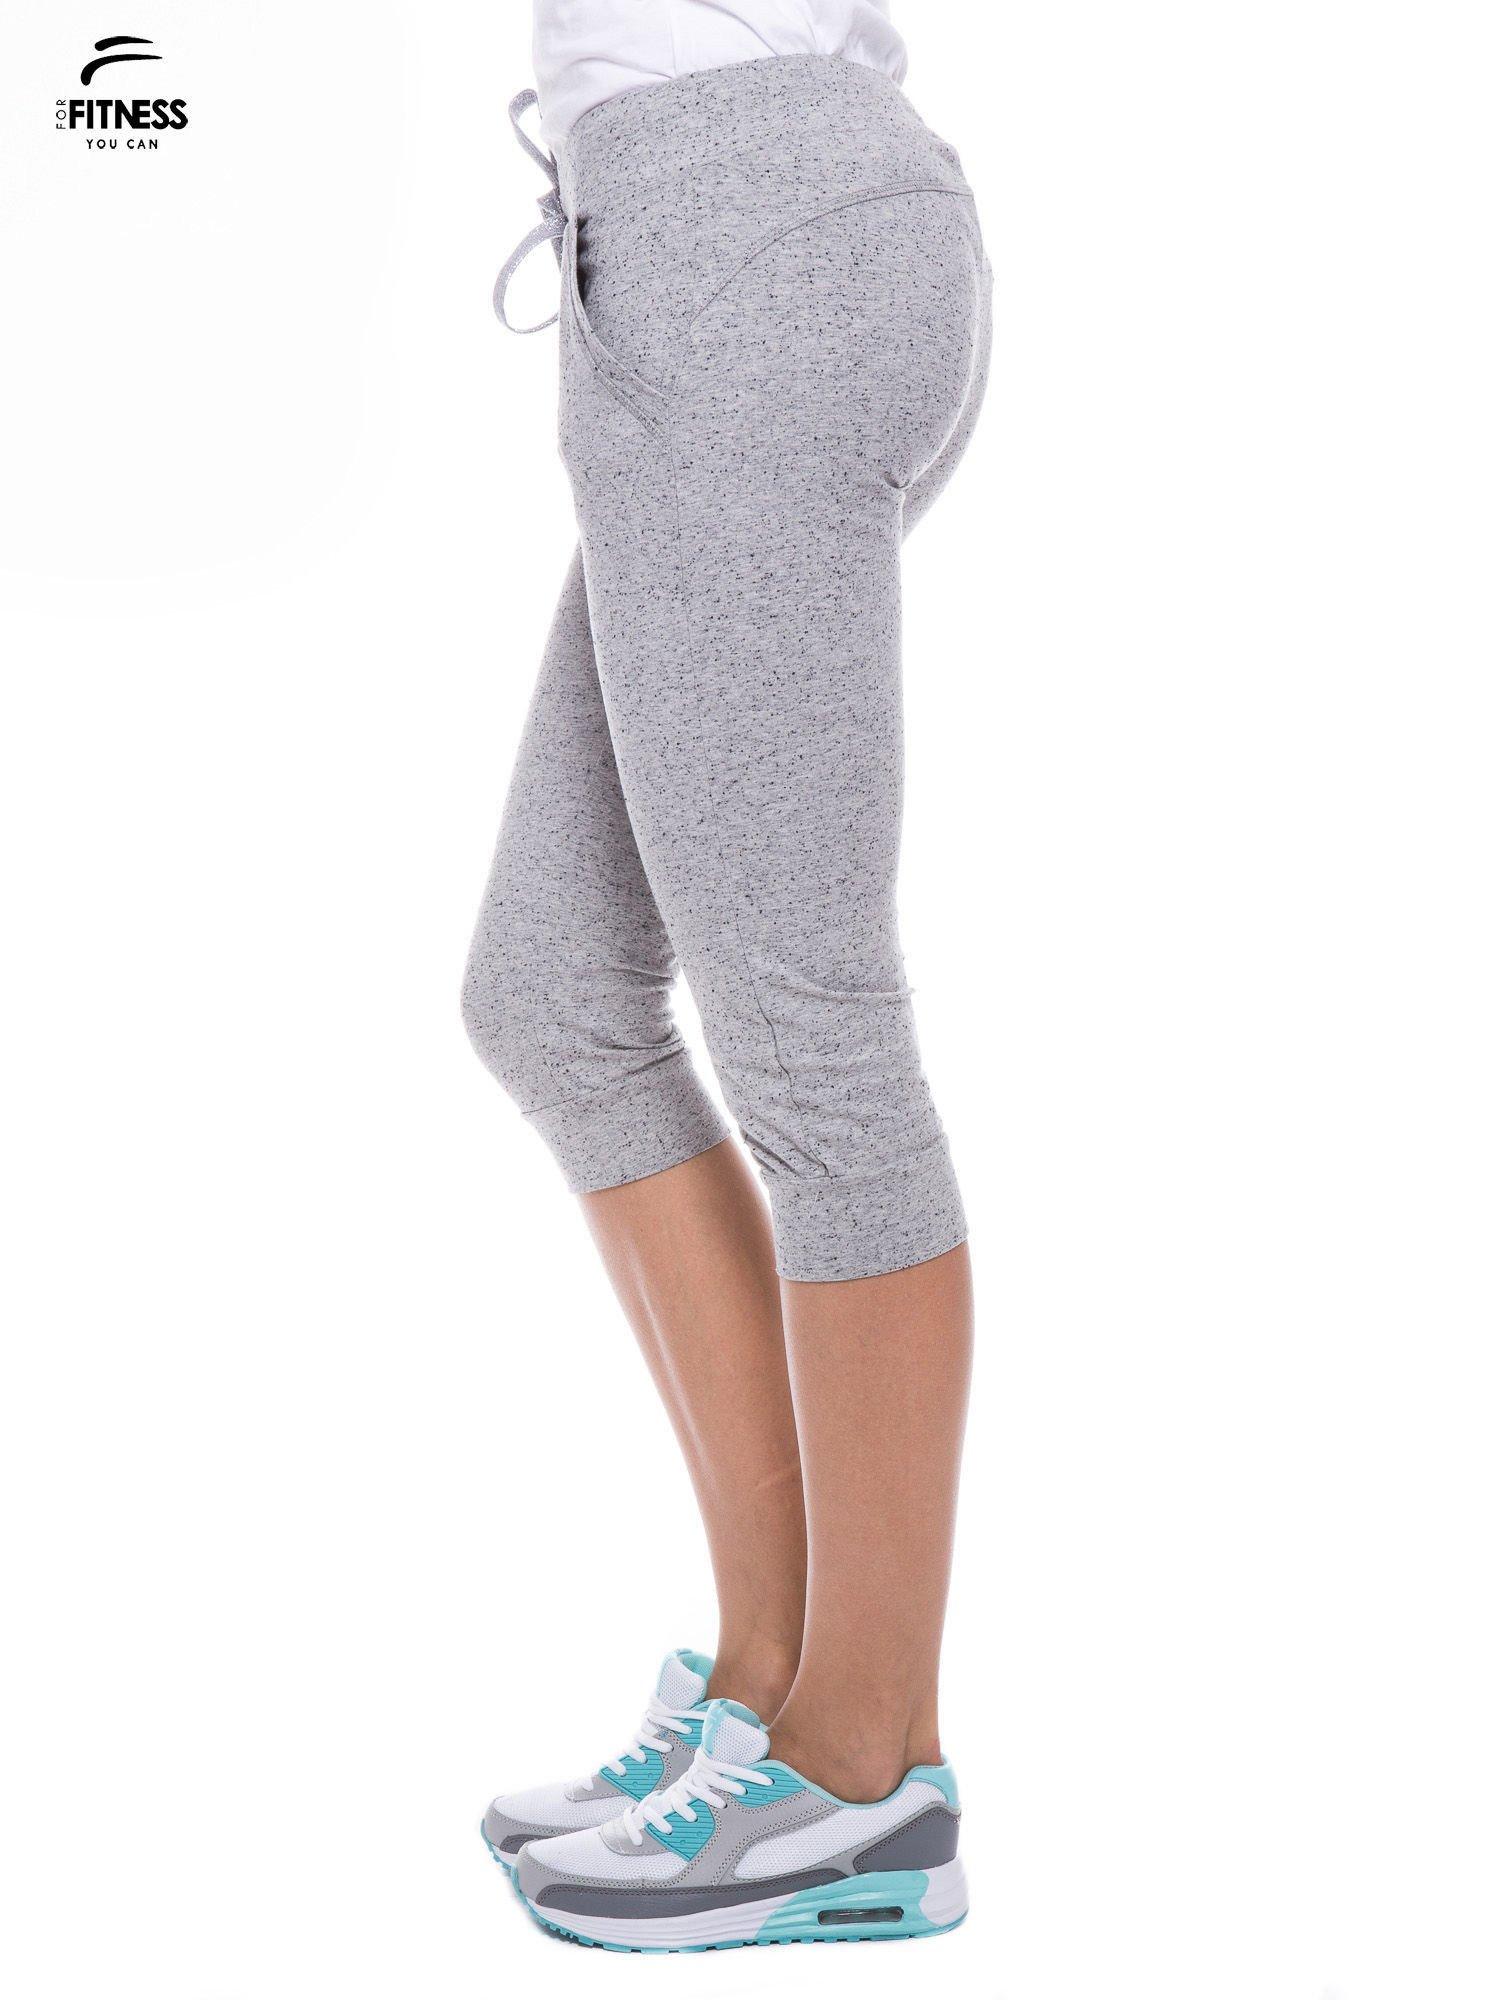 Szare sportowe spodnie za kolano typu capri                                  zdj.                                  3